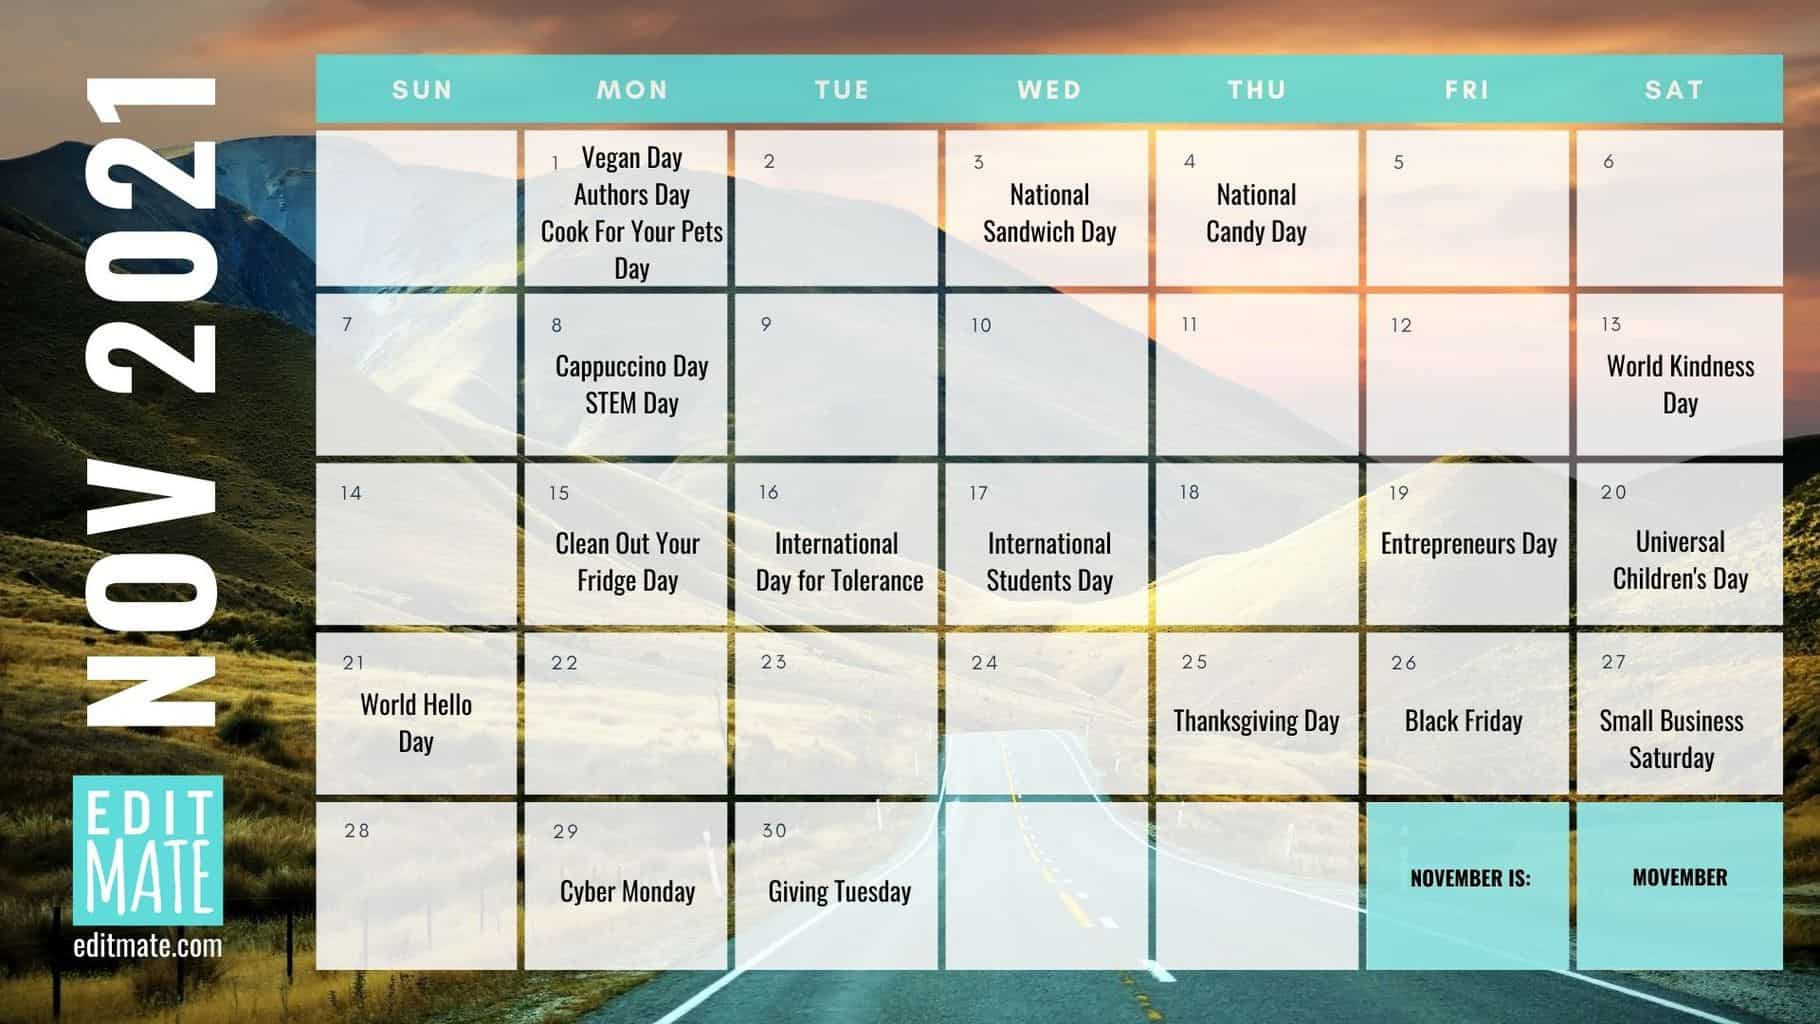 2021 Social Media Holiday Calendar | Editmate-National Food Days 2021 Printable